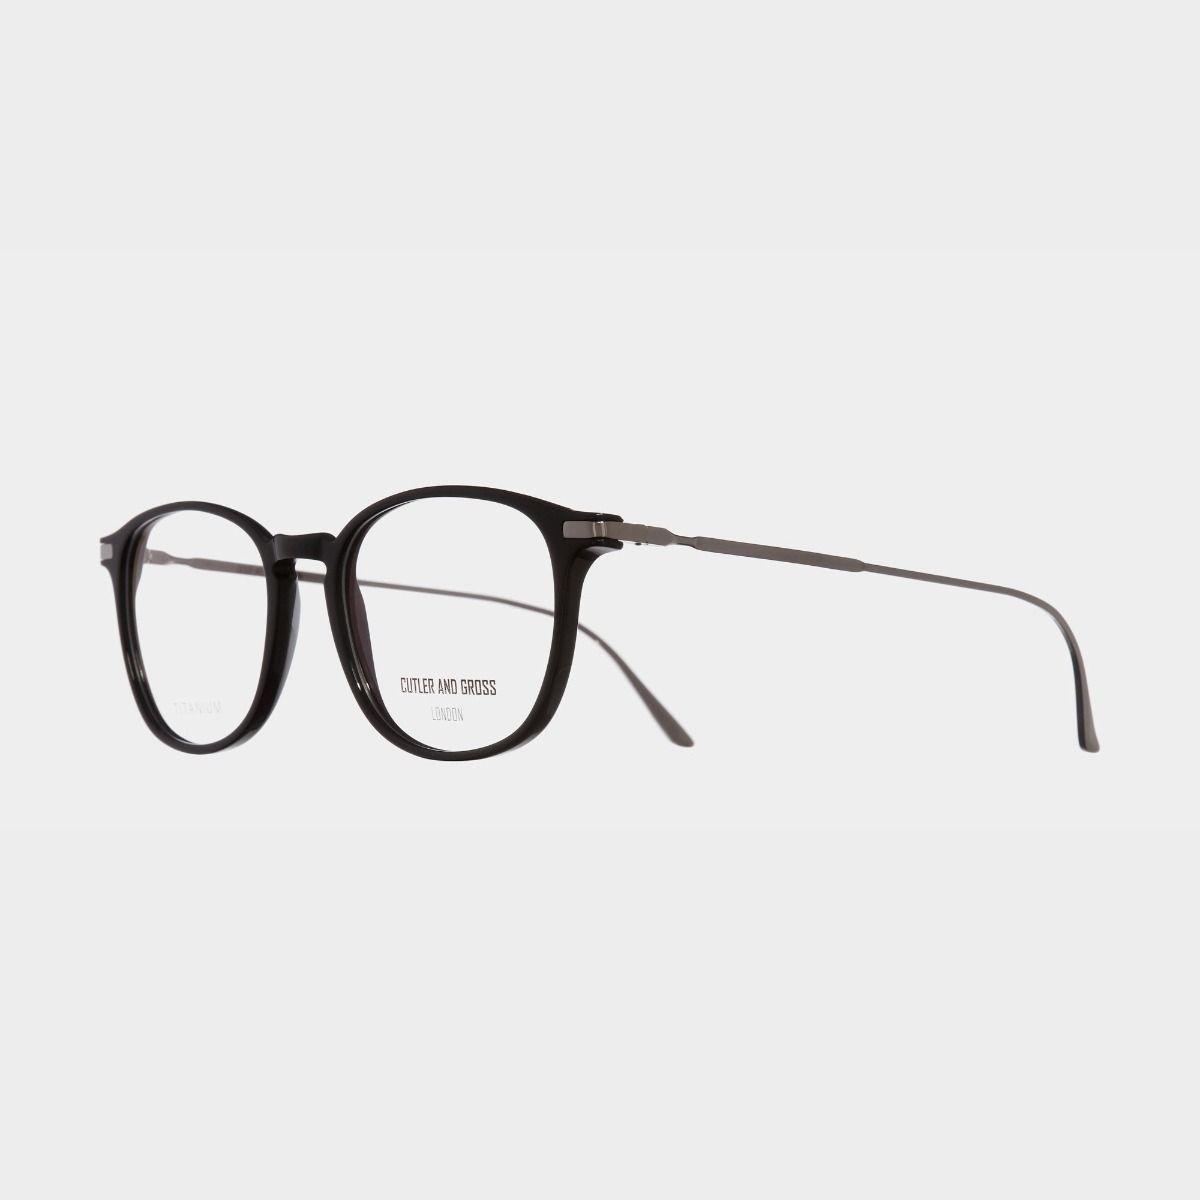 1303V2 Optical Square Glasses (Large)